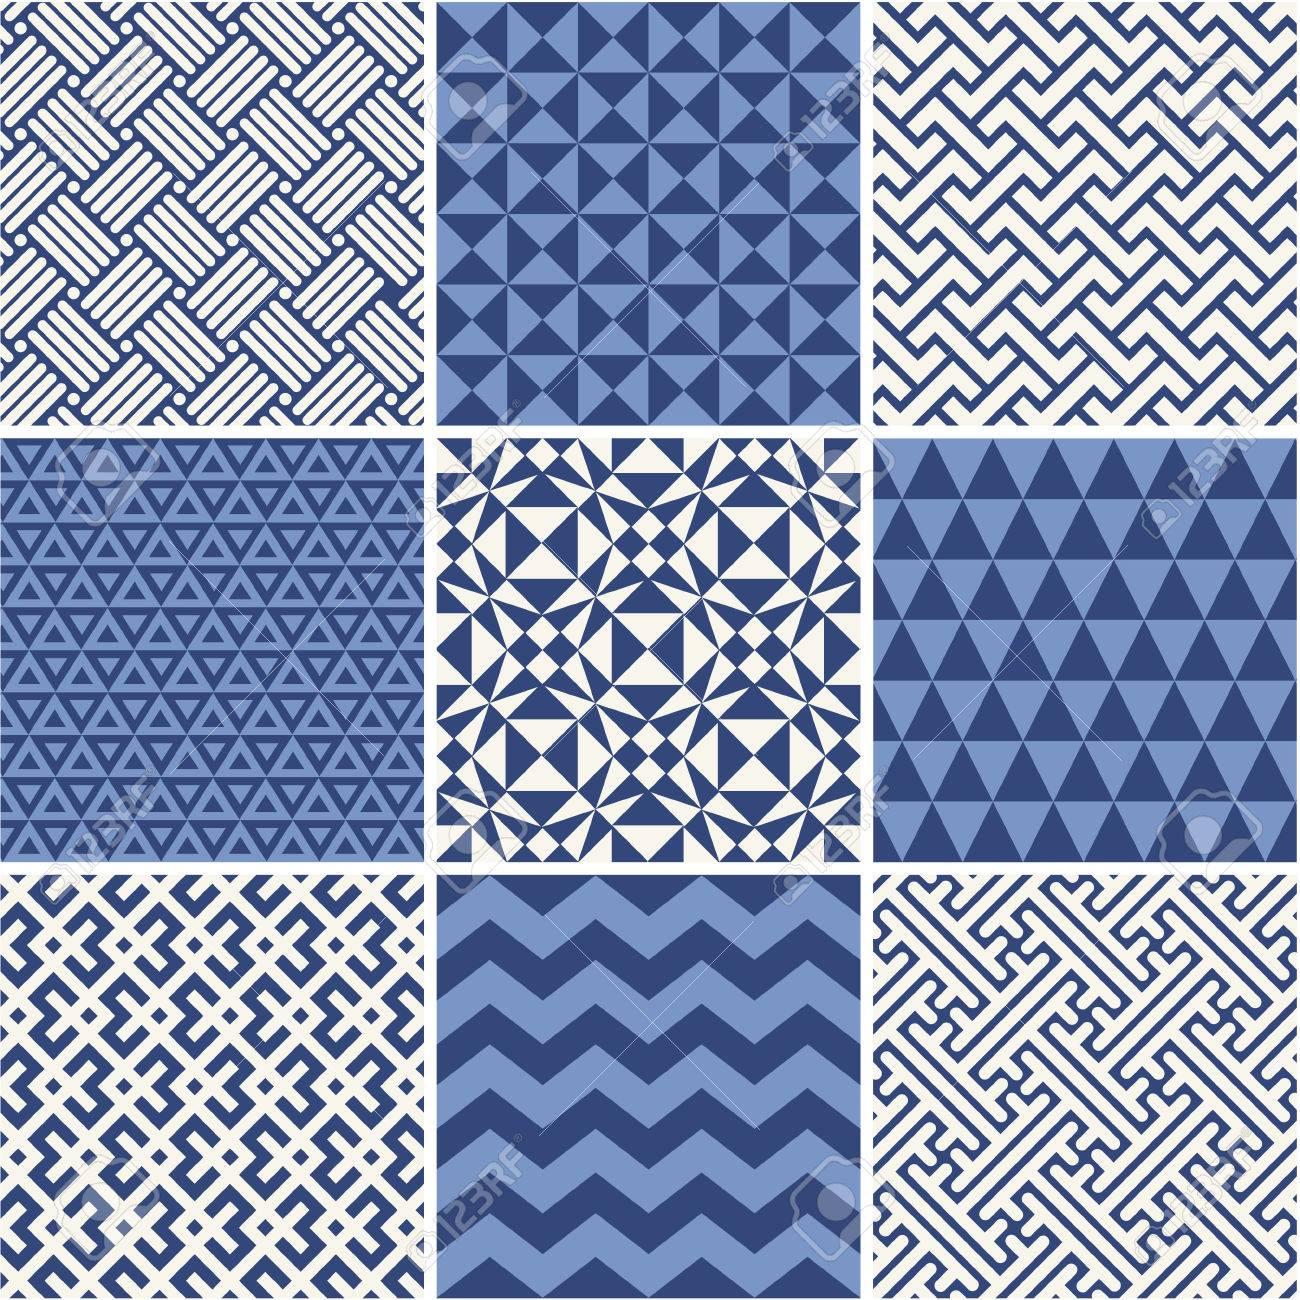 Set of monochrome geometric ornaments - white and blue. - 39328589